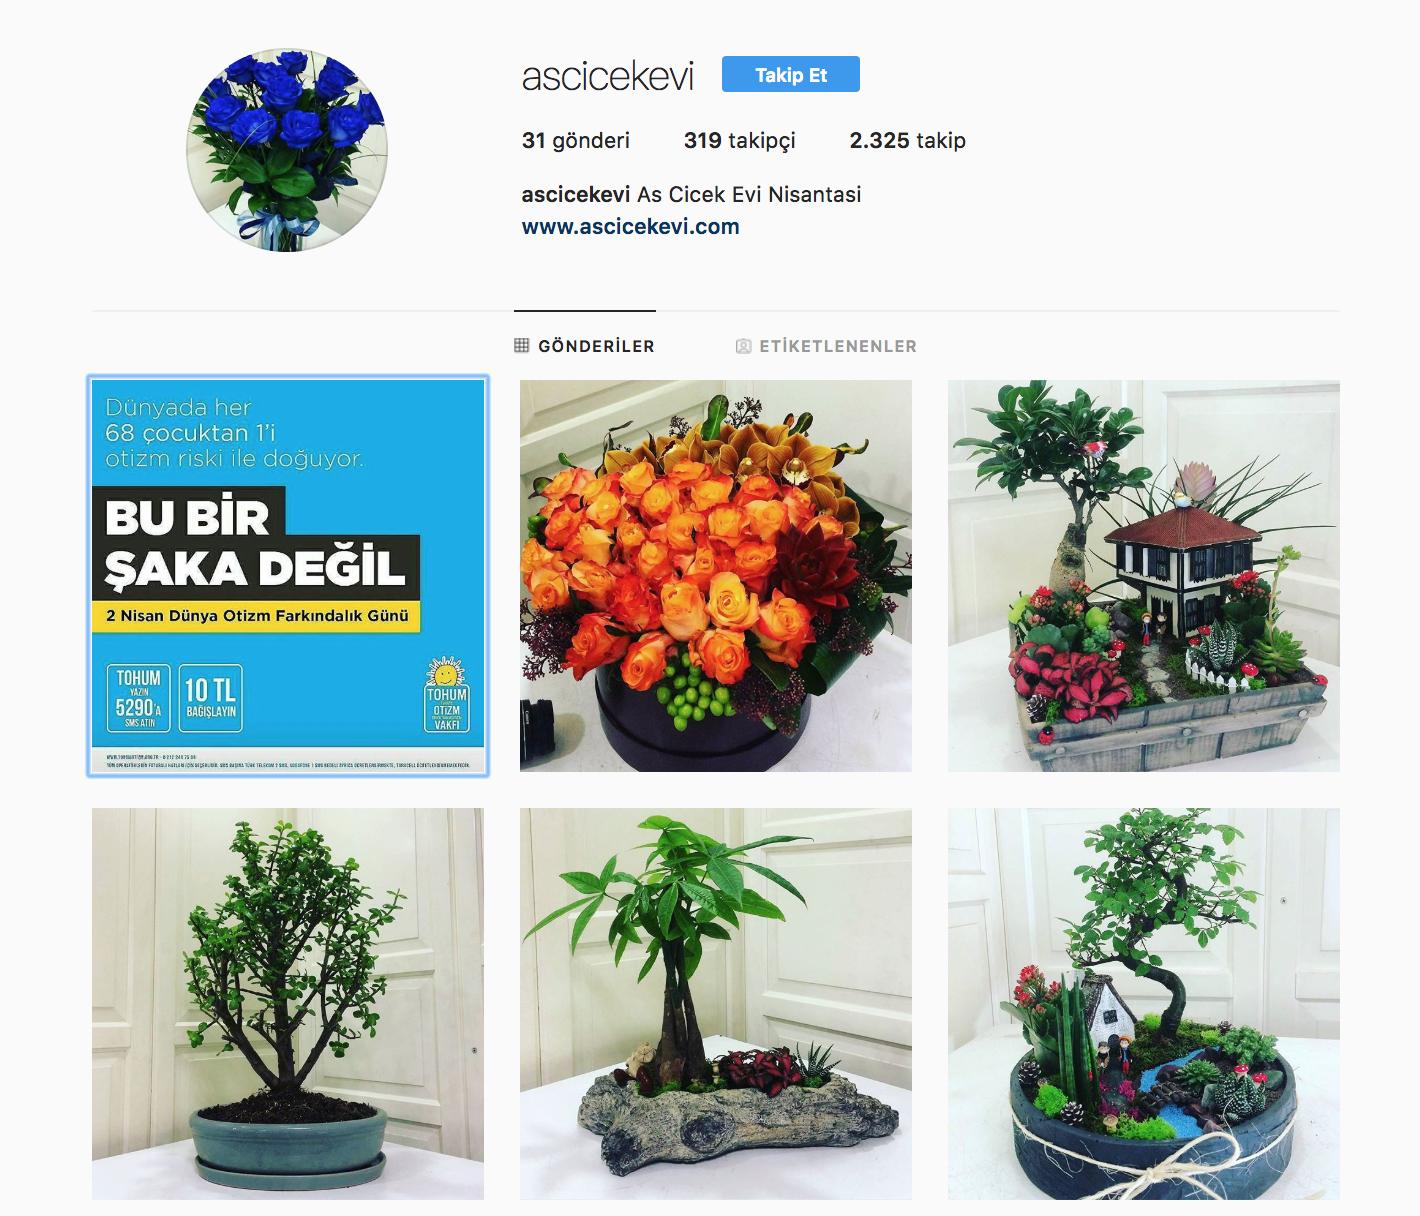 as-cicek-evi-instagram